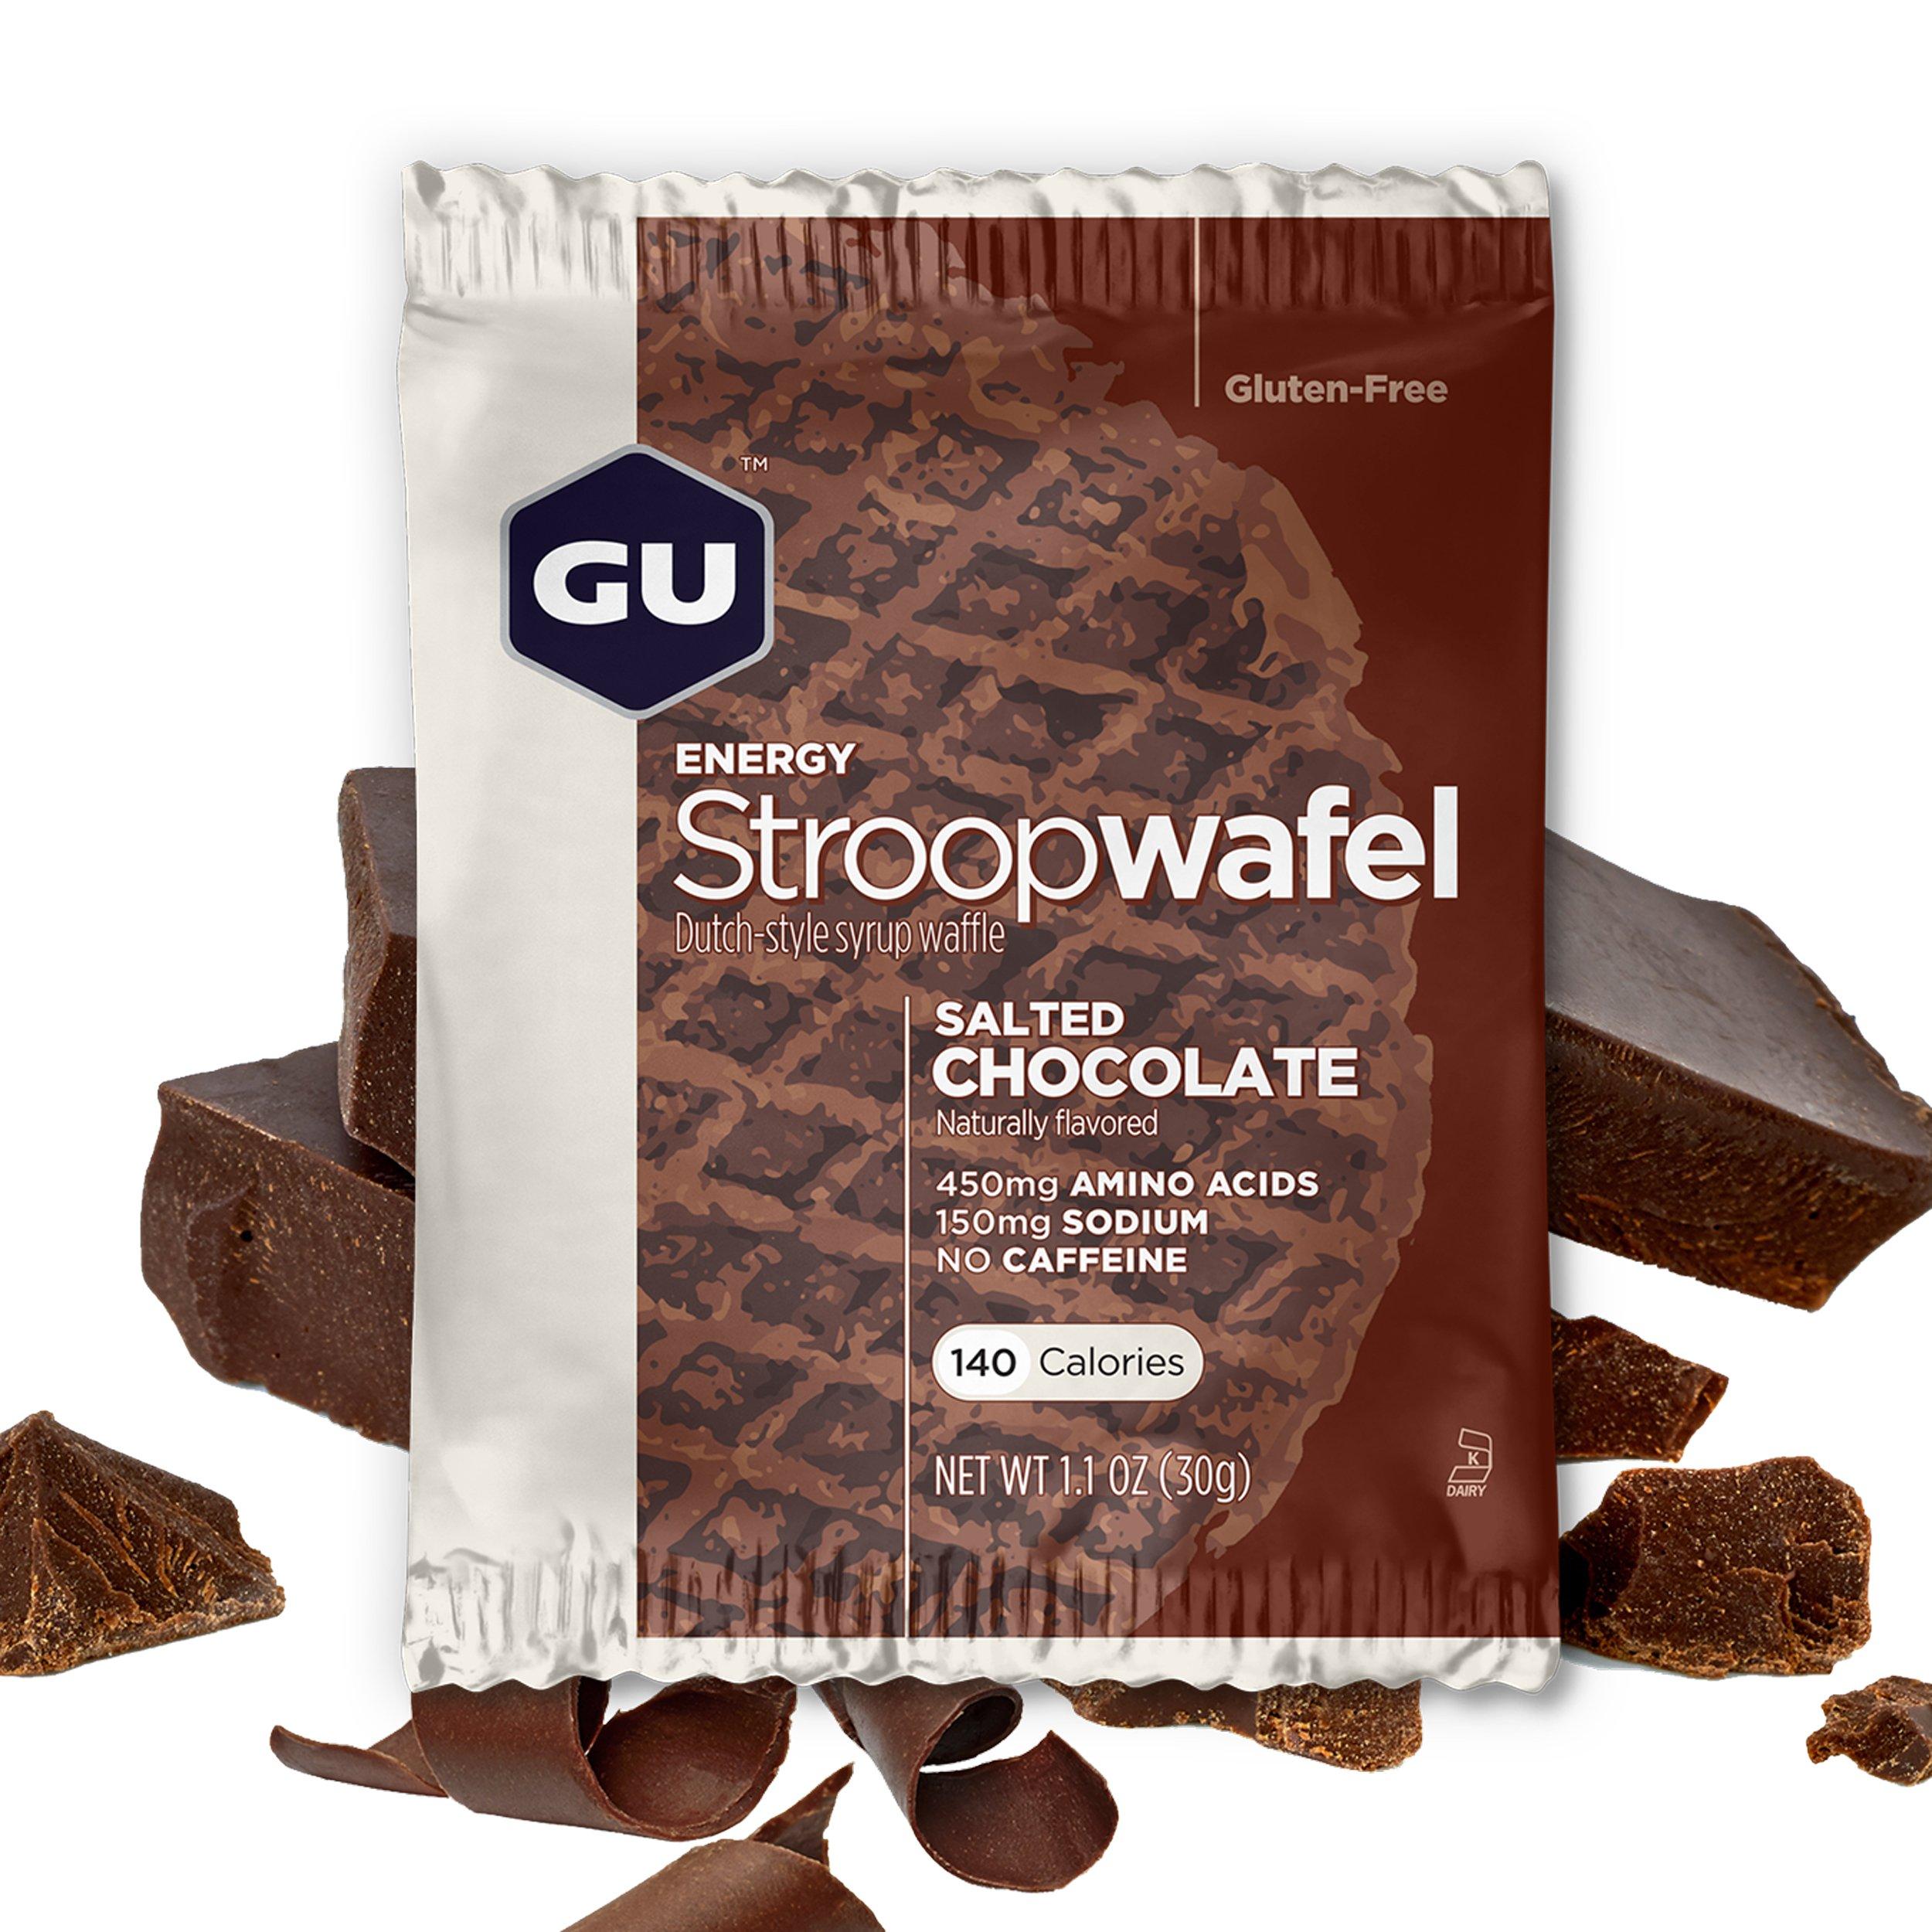 GU Energy Stroopwafel Sports Nutrition Waffle, Gluten Free Salted Chocolate, 16-Count